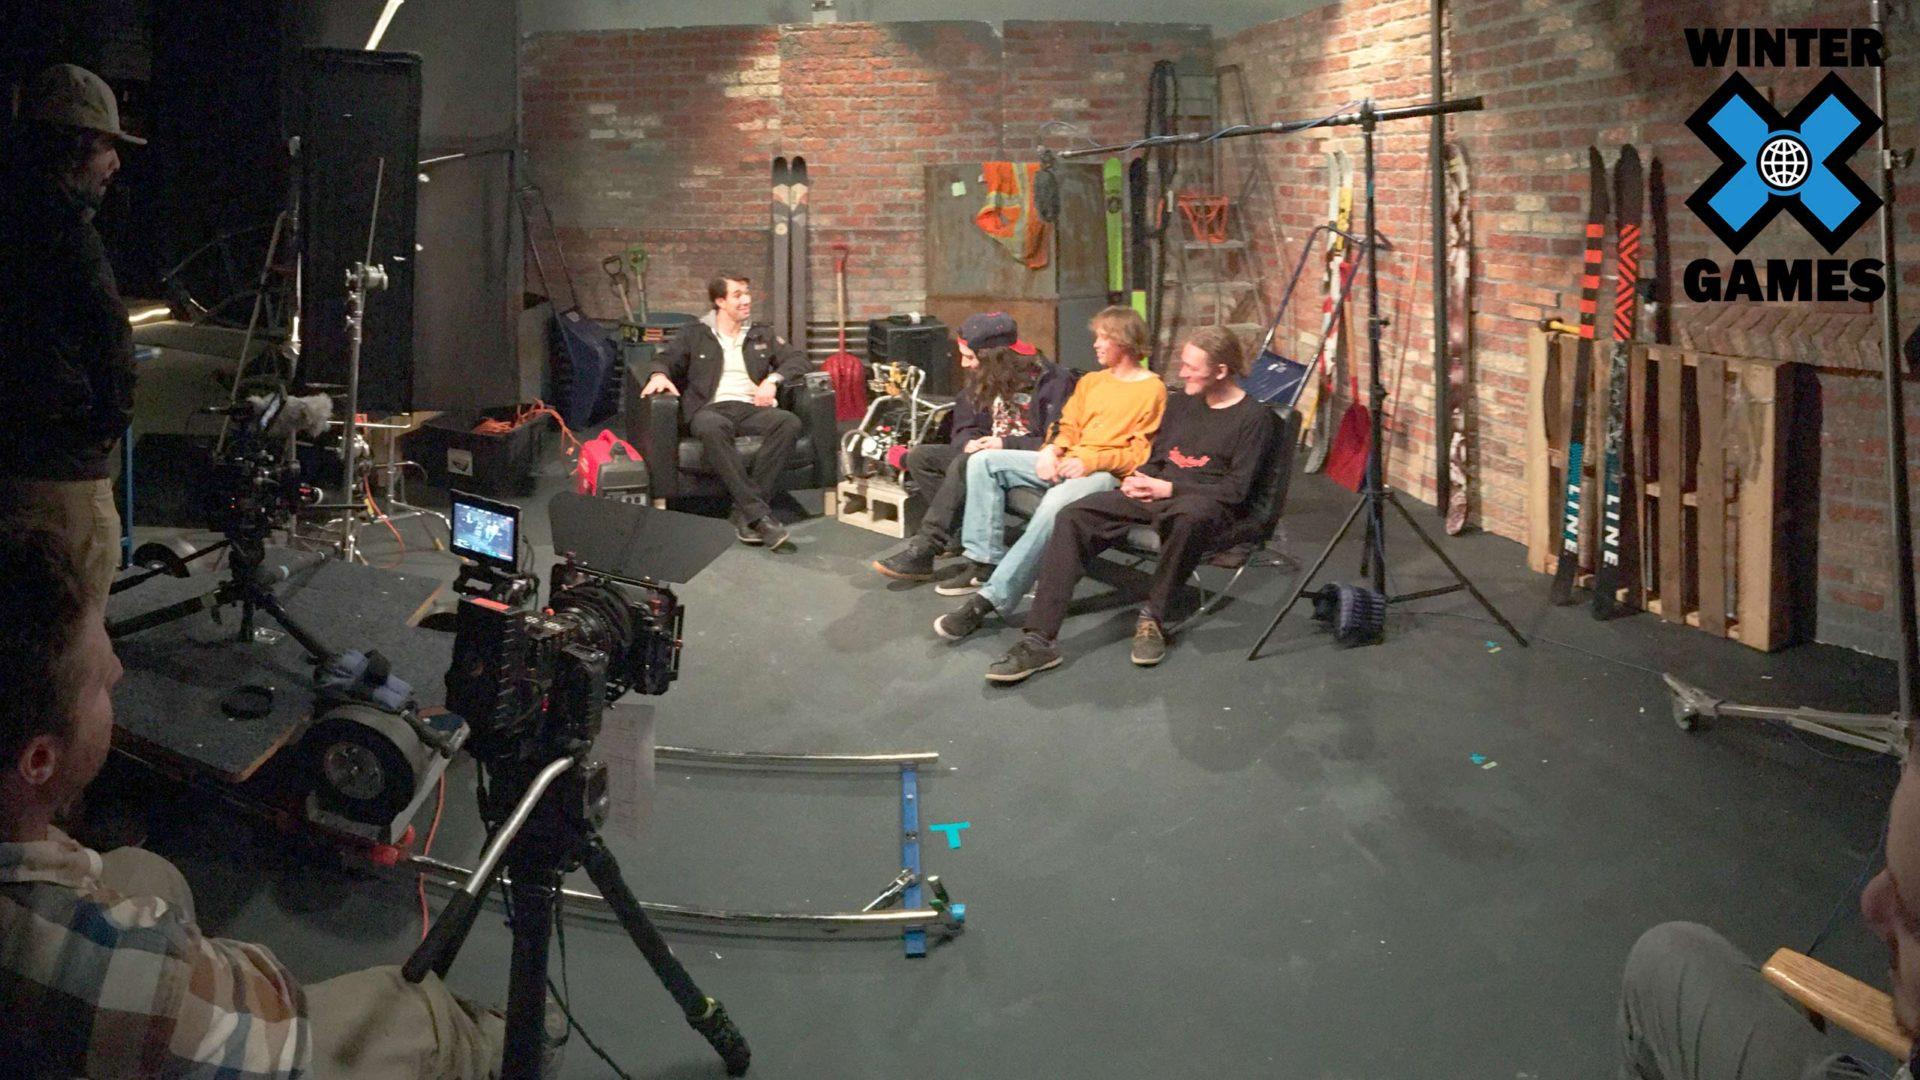 x games set at skytheory interviews